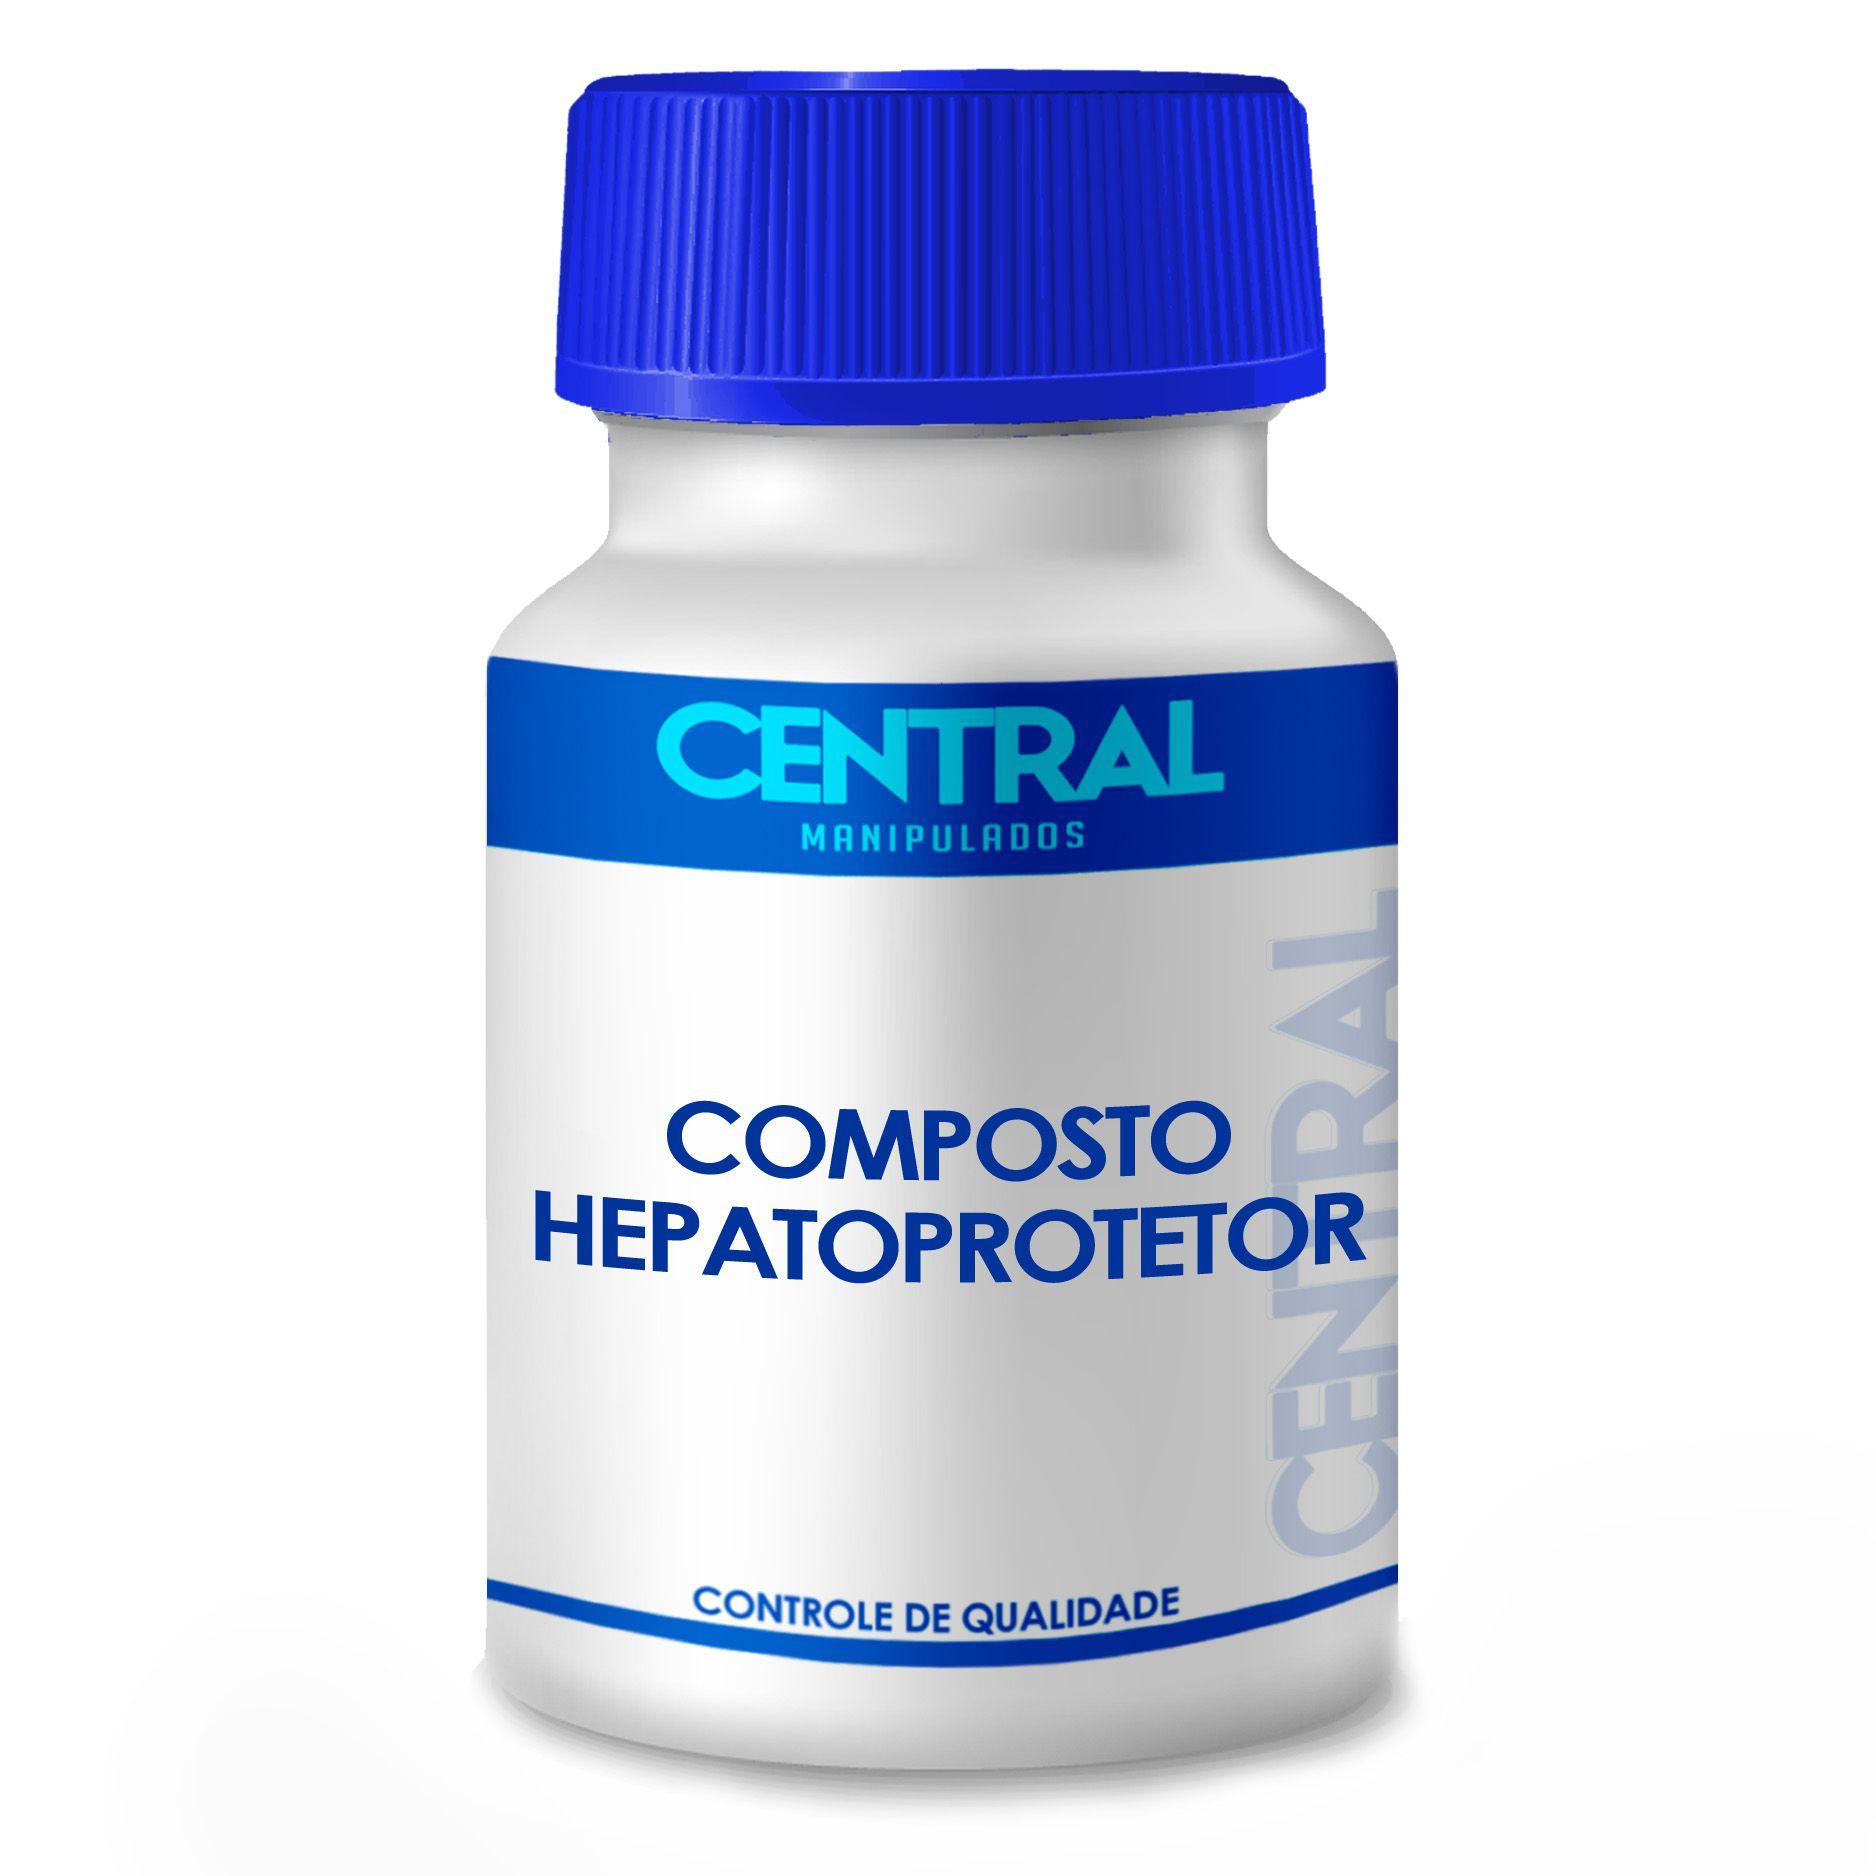 Composto Hepatoprotetor 90 cápsulas